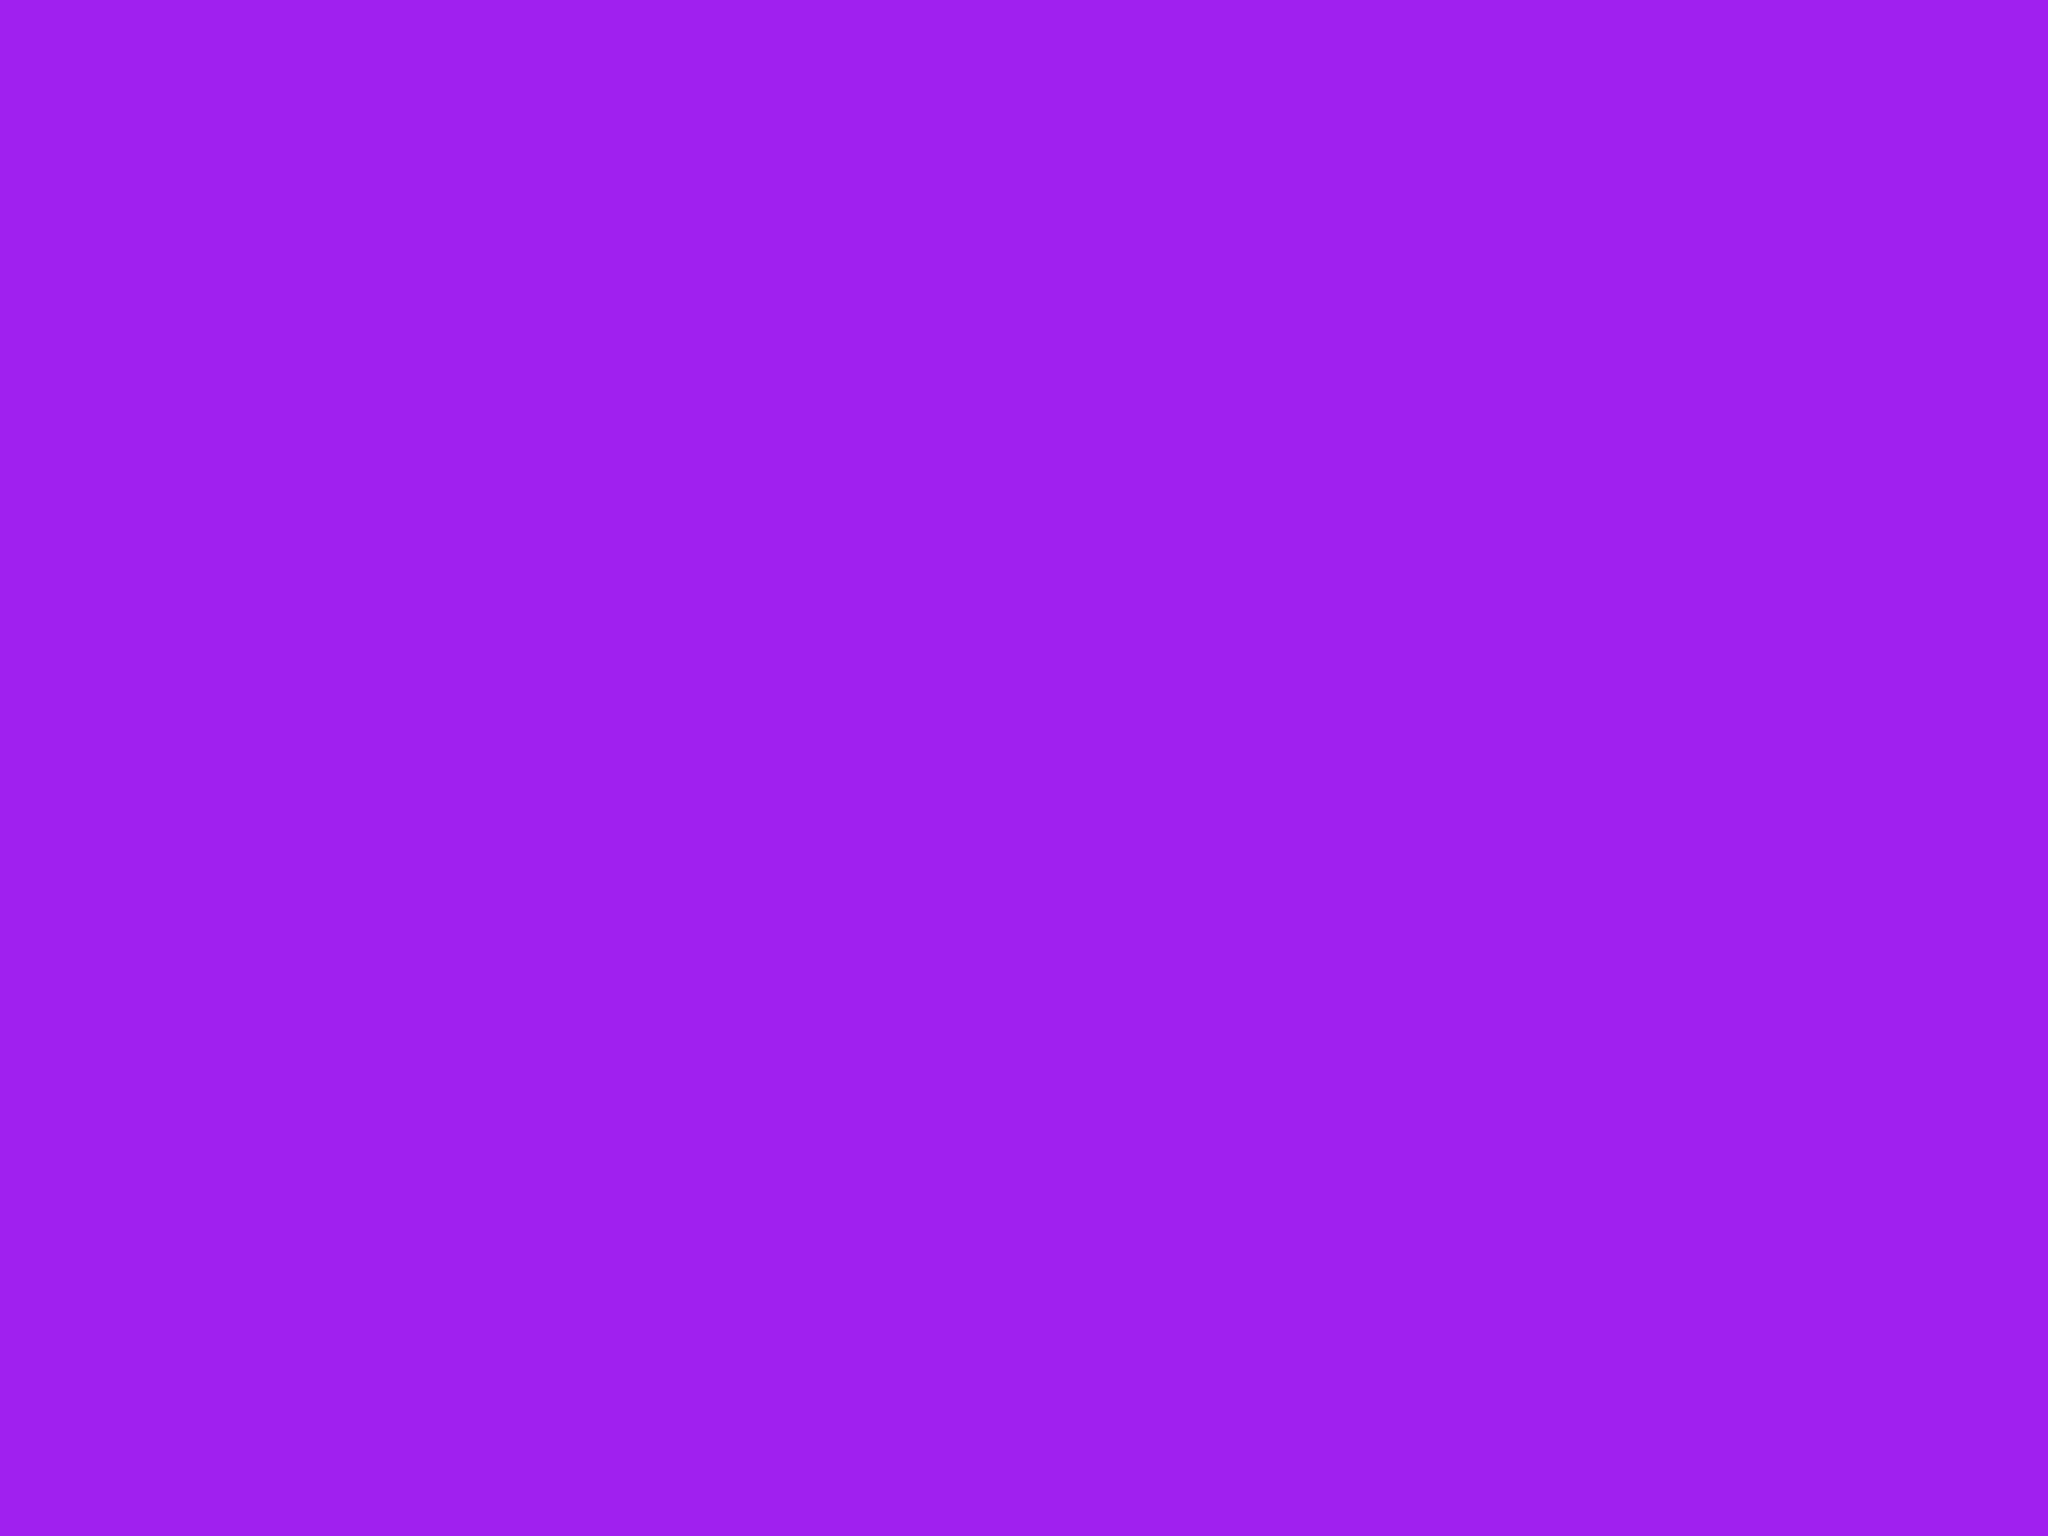 2048x1536 Purple X11 Gui Solid Color Background